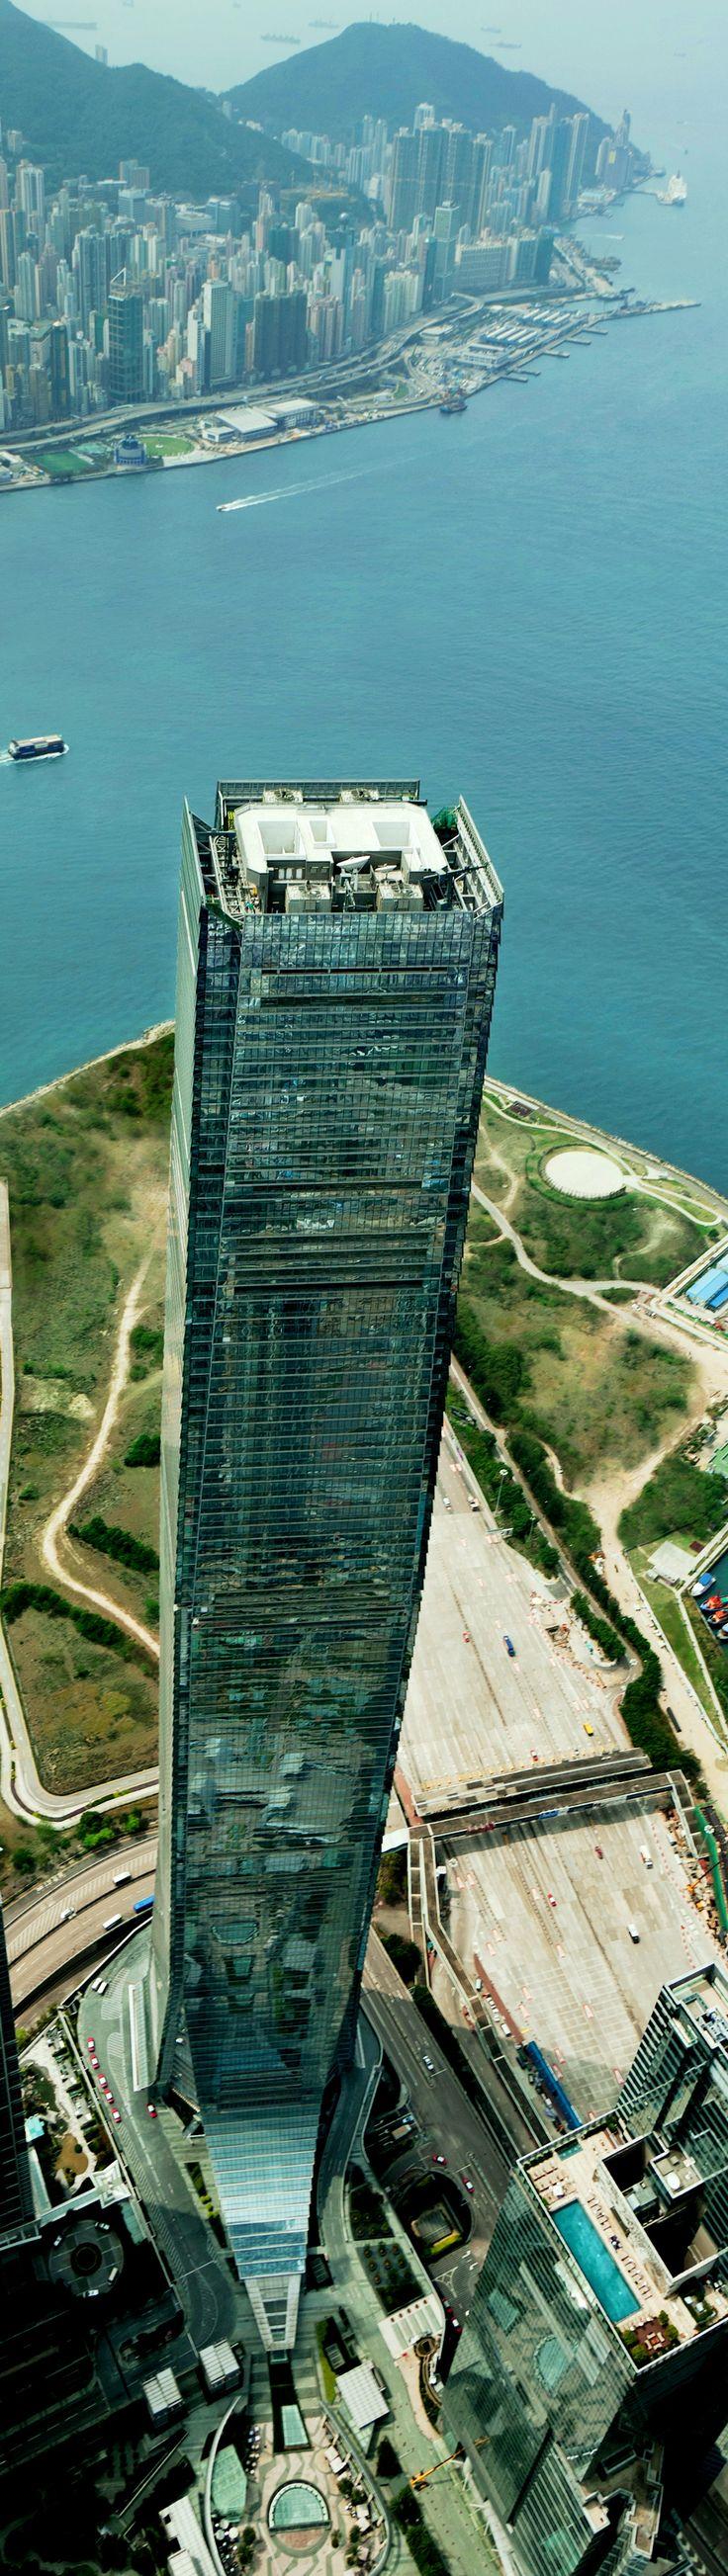 International Commerce Centre (ICC), Kohn Pedersen Fox (KPF)  #architecture ☮k☮